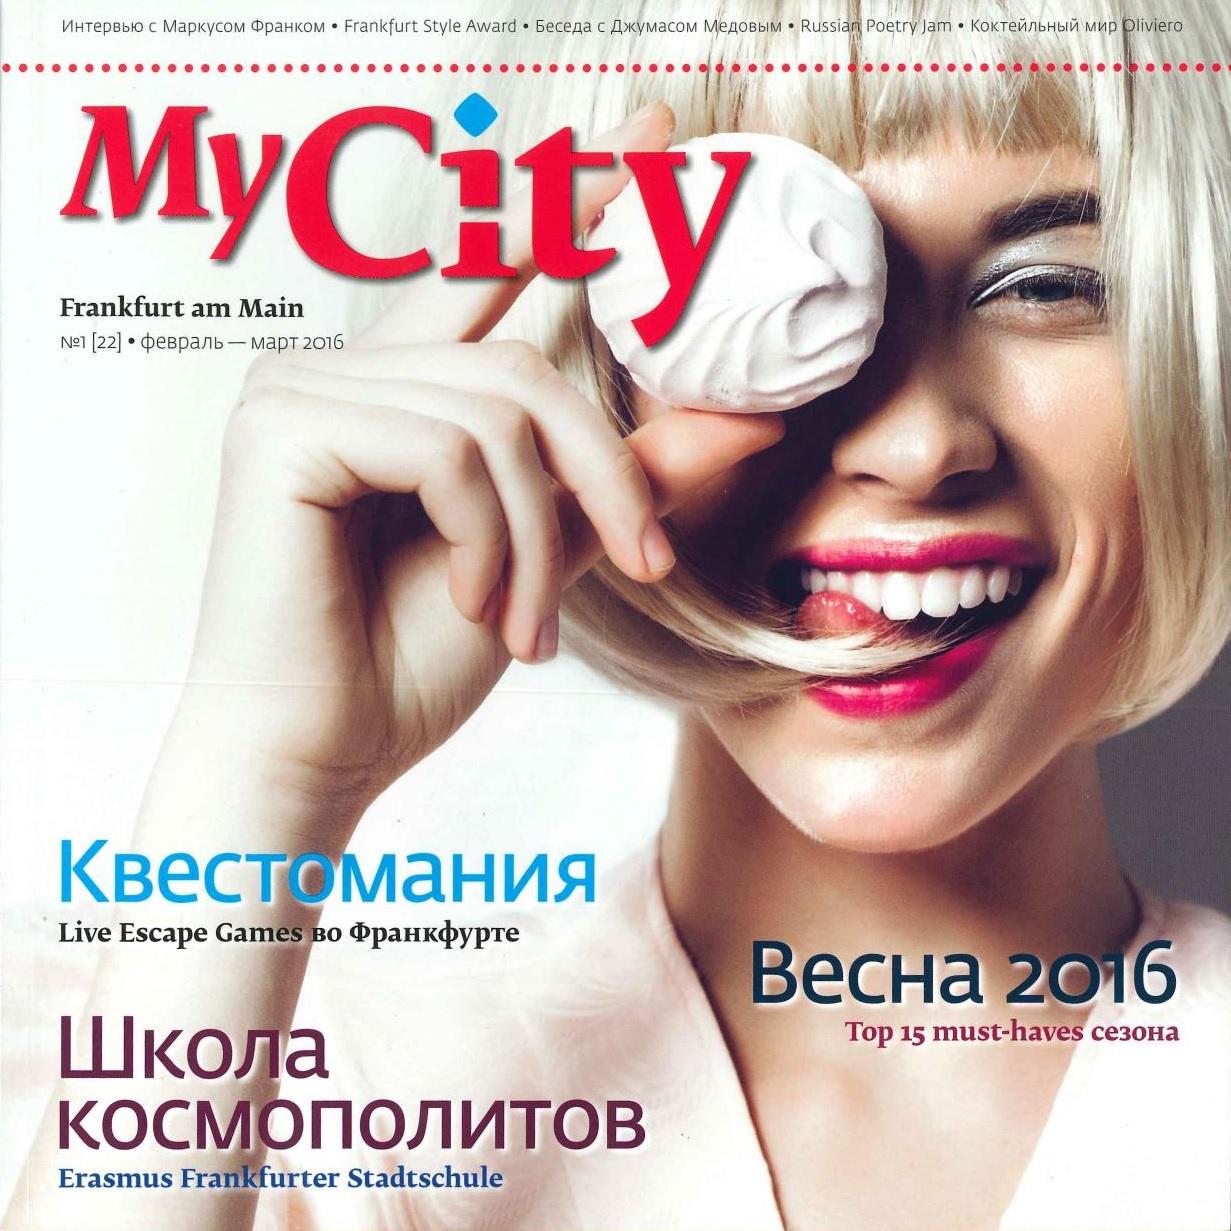 My City_Deckblatt